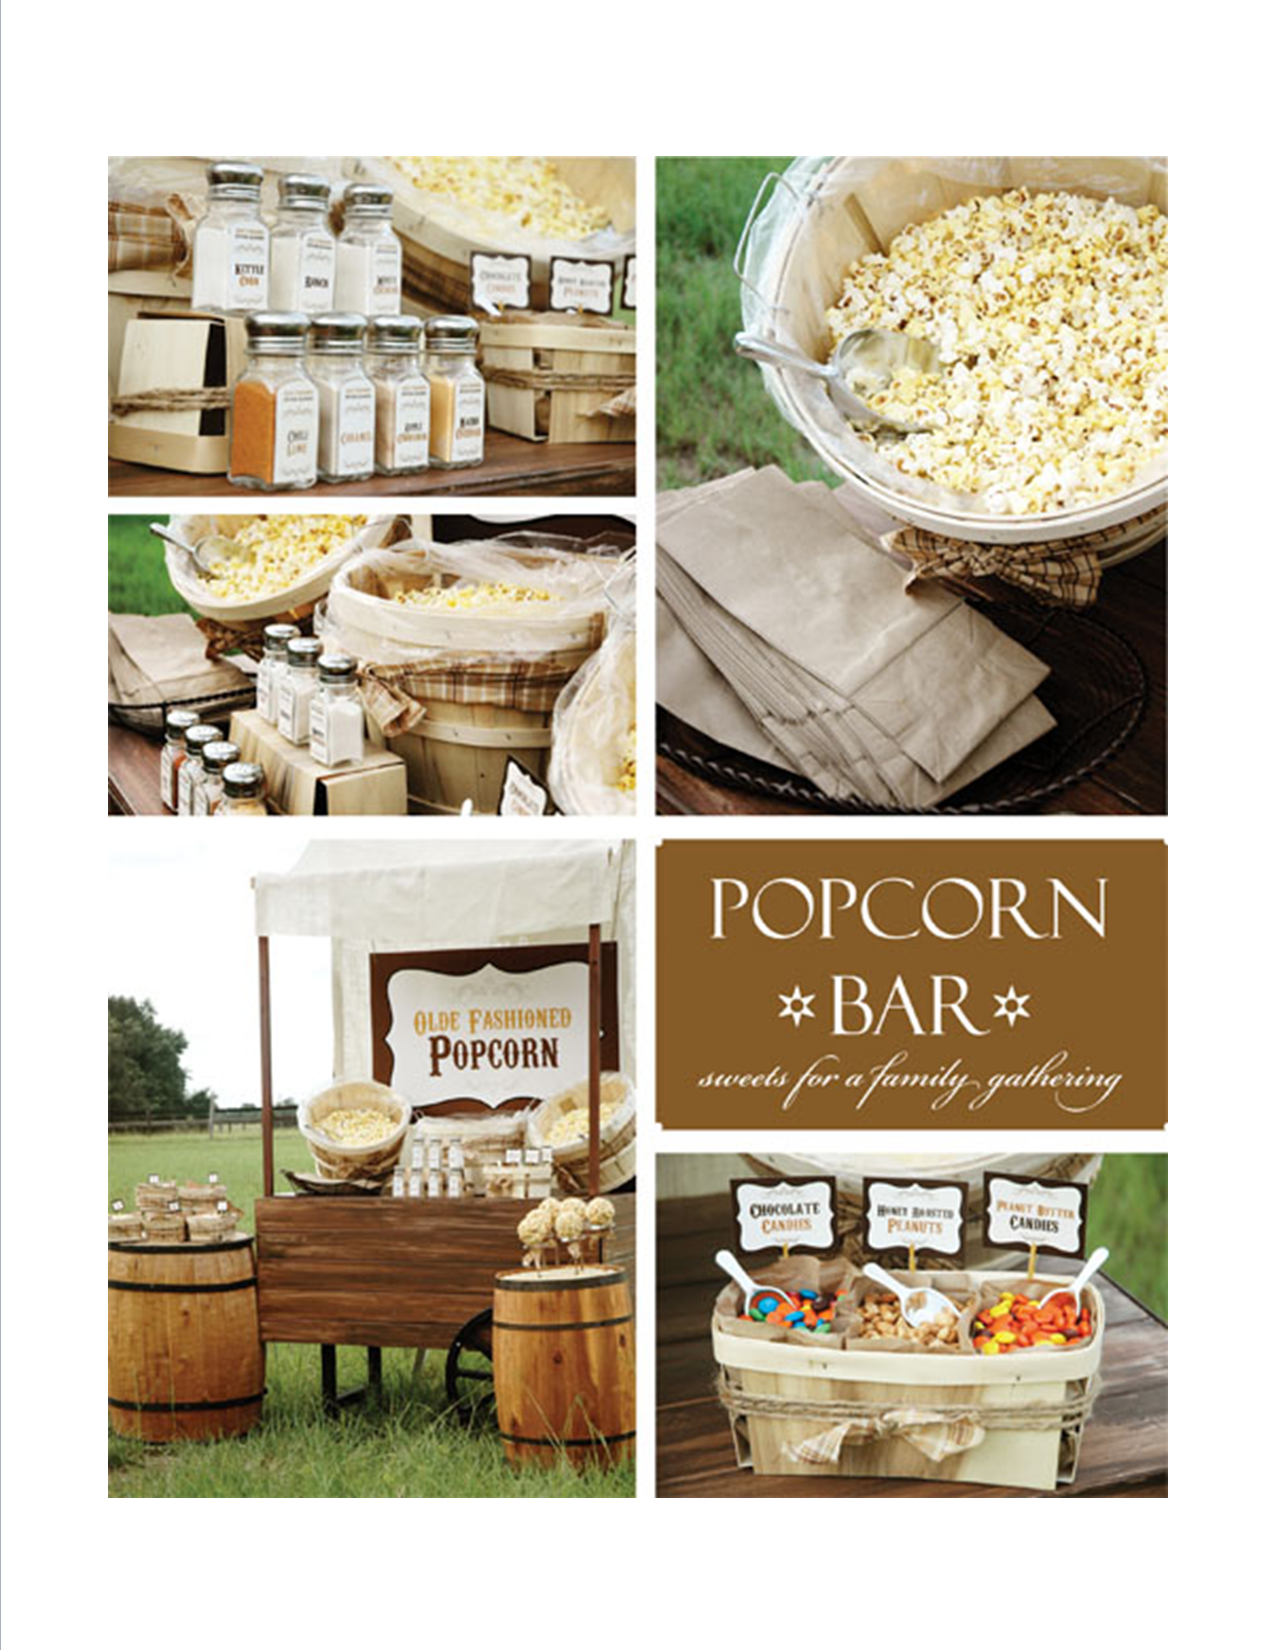 Popcorn Bar Gift Party Ideas Pinterest